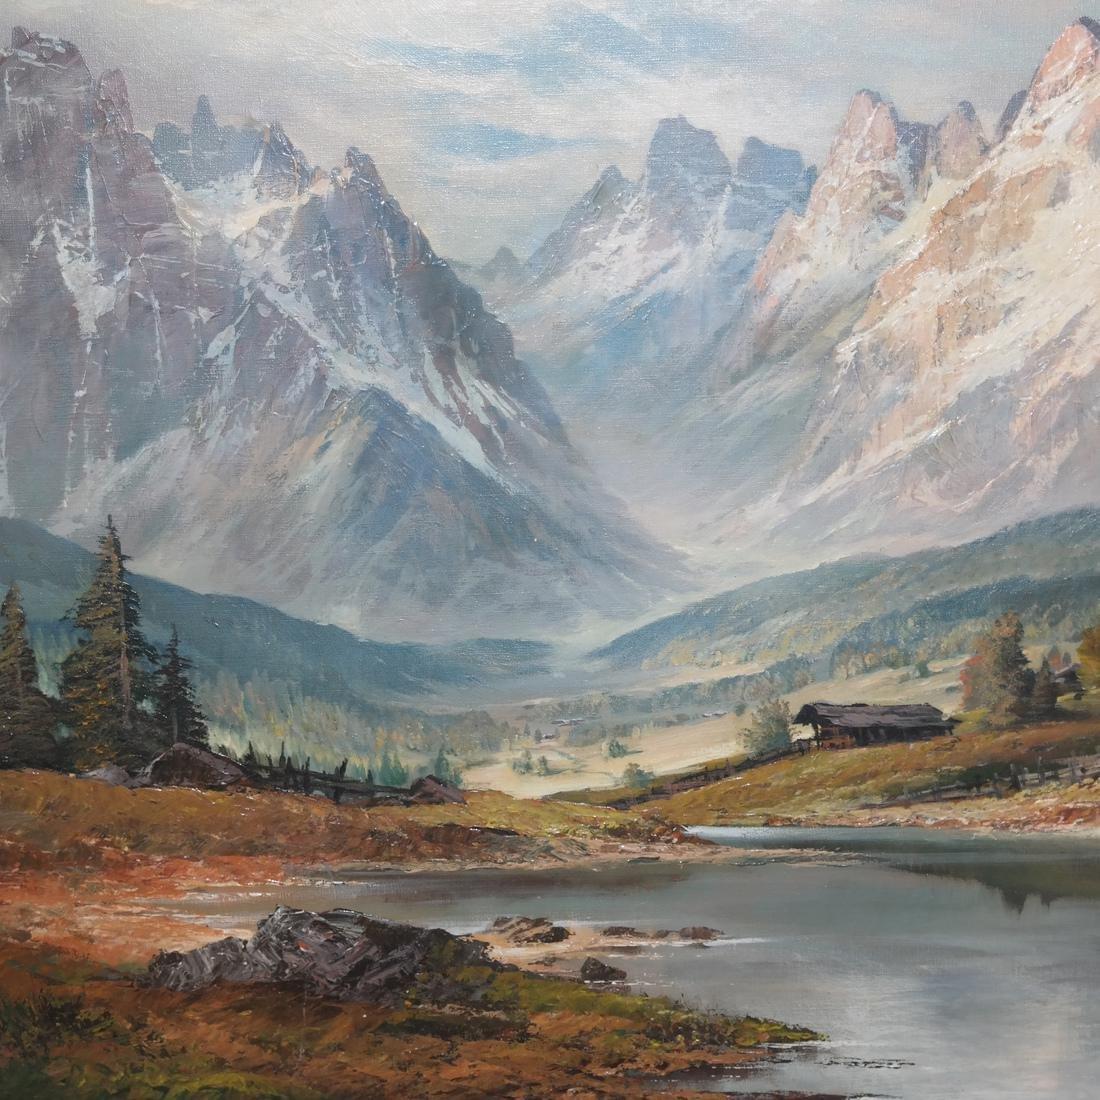 Mountain, River Landscape - O/C - 5